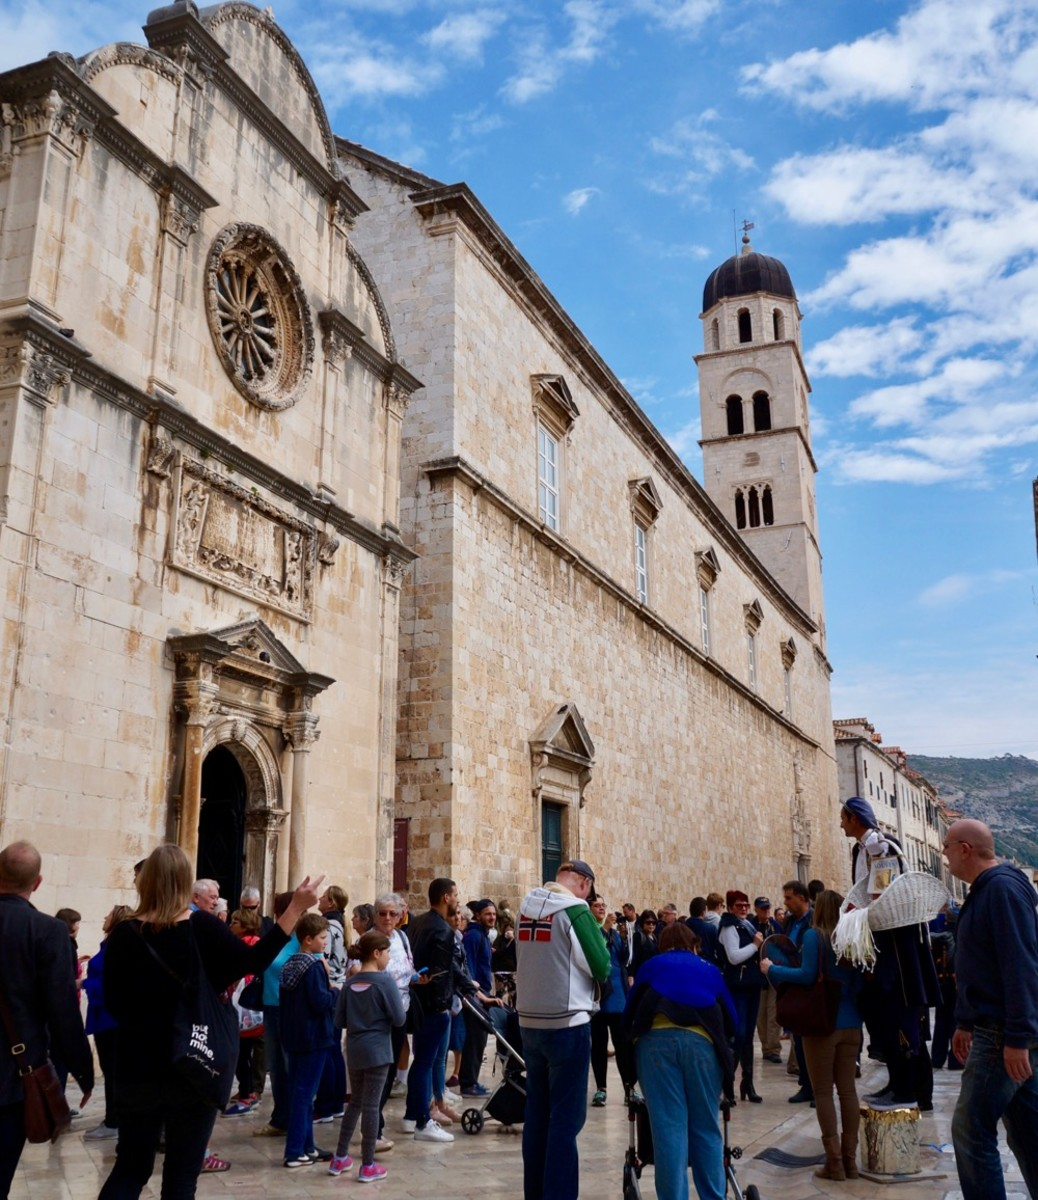 Heritage City of Dubrovnik